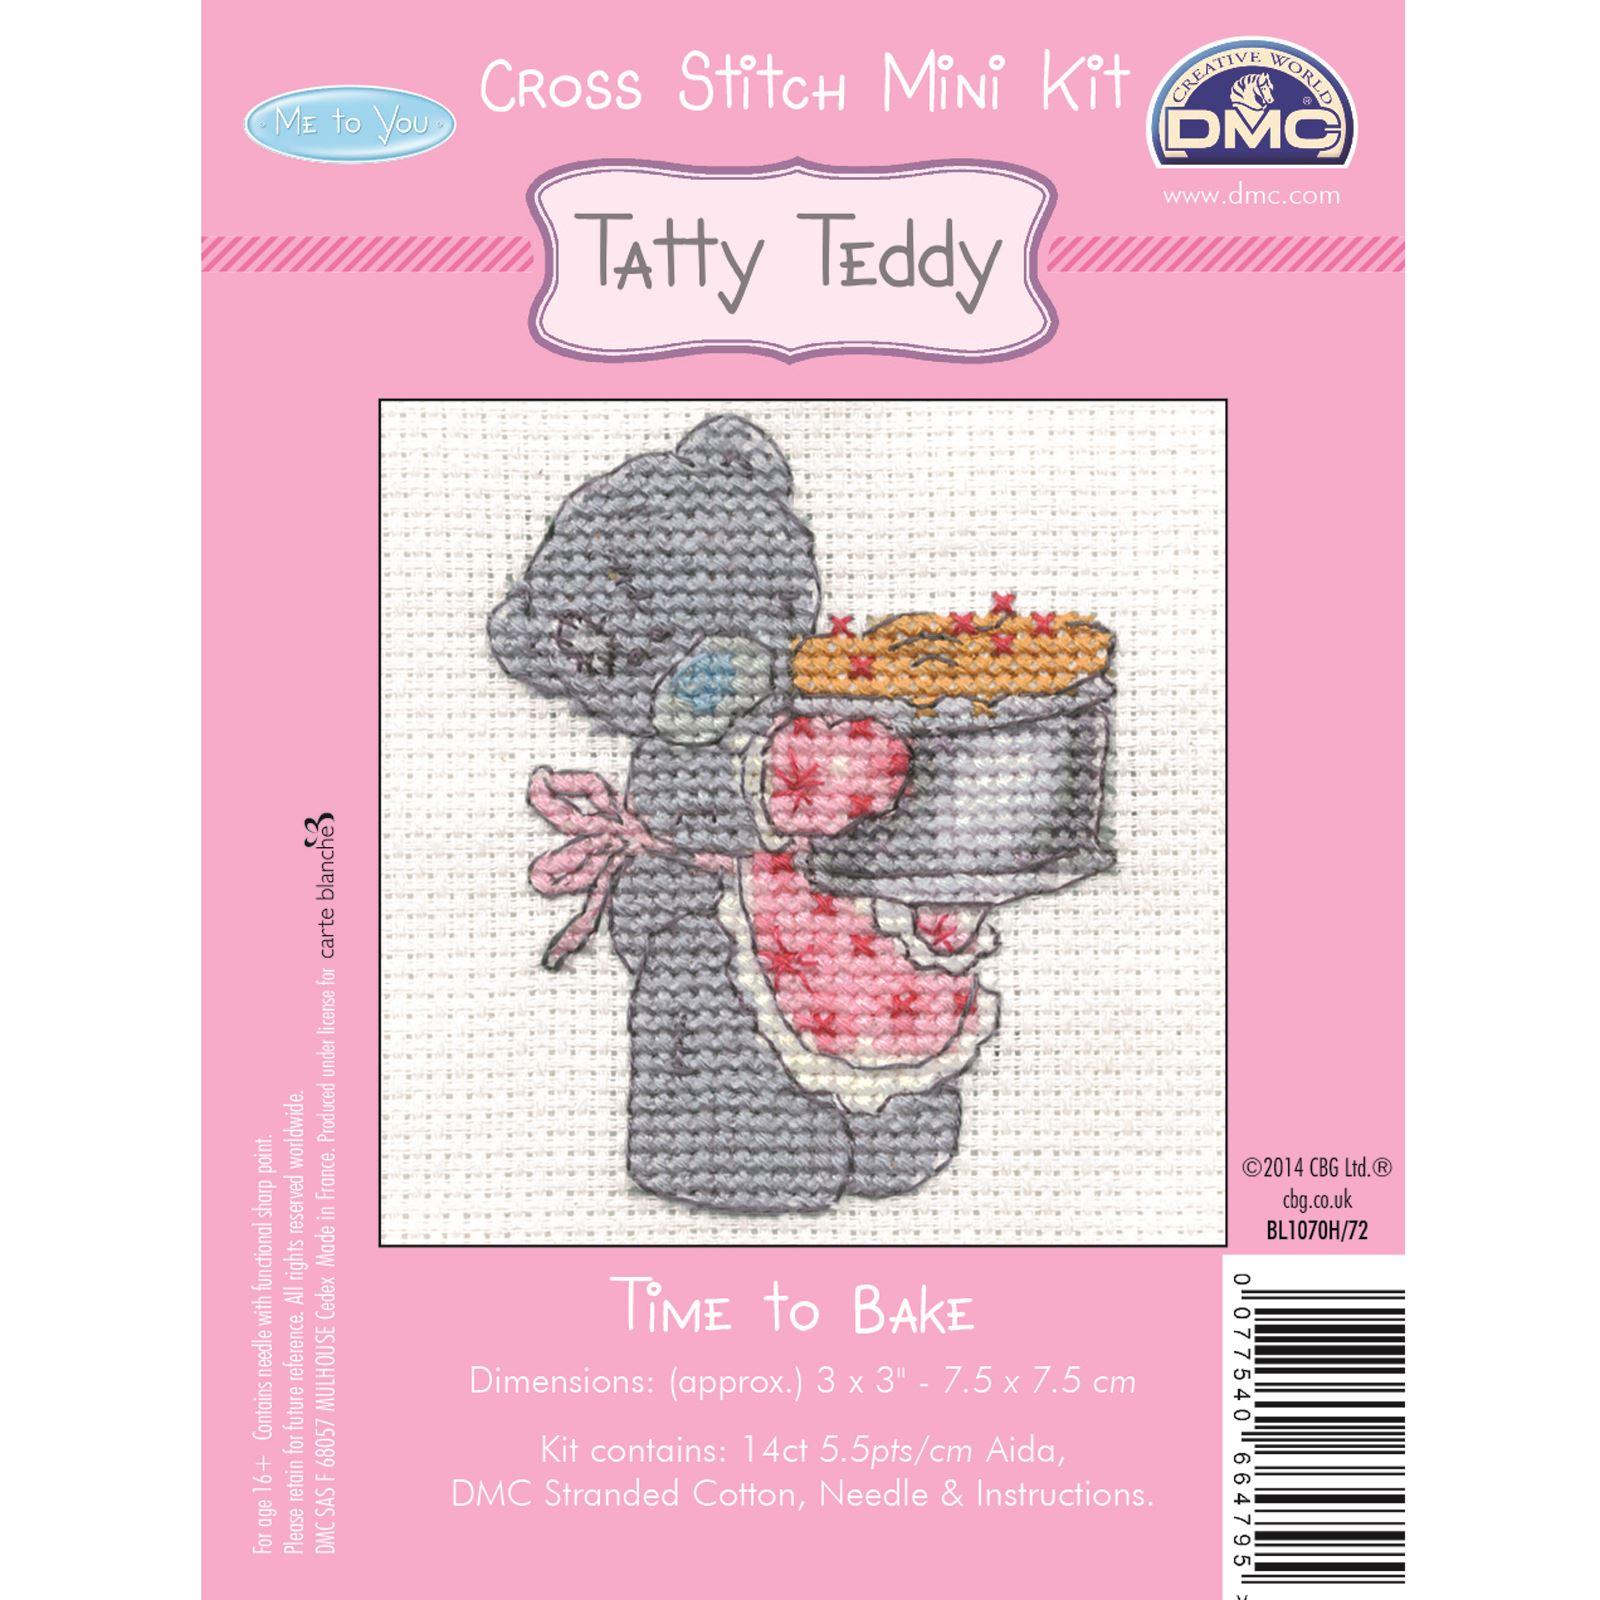 DMC-Mini-Cross-Stitch-Kit-Me-to-You-Tatty-Teddy-8-Designs thumbnail 15